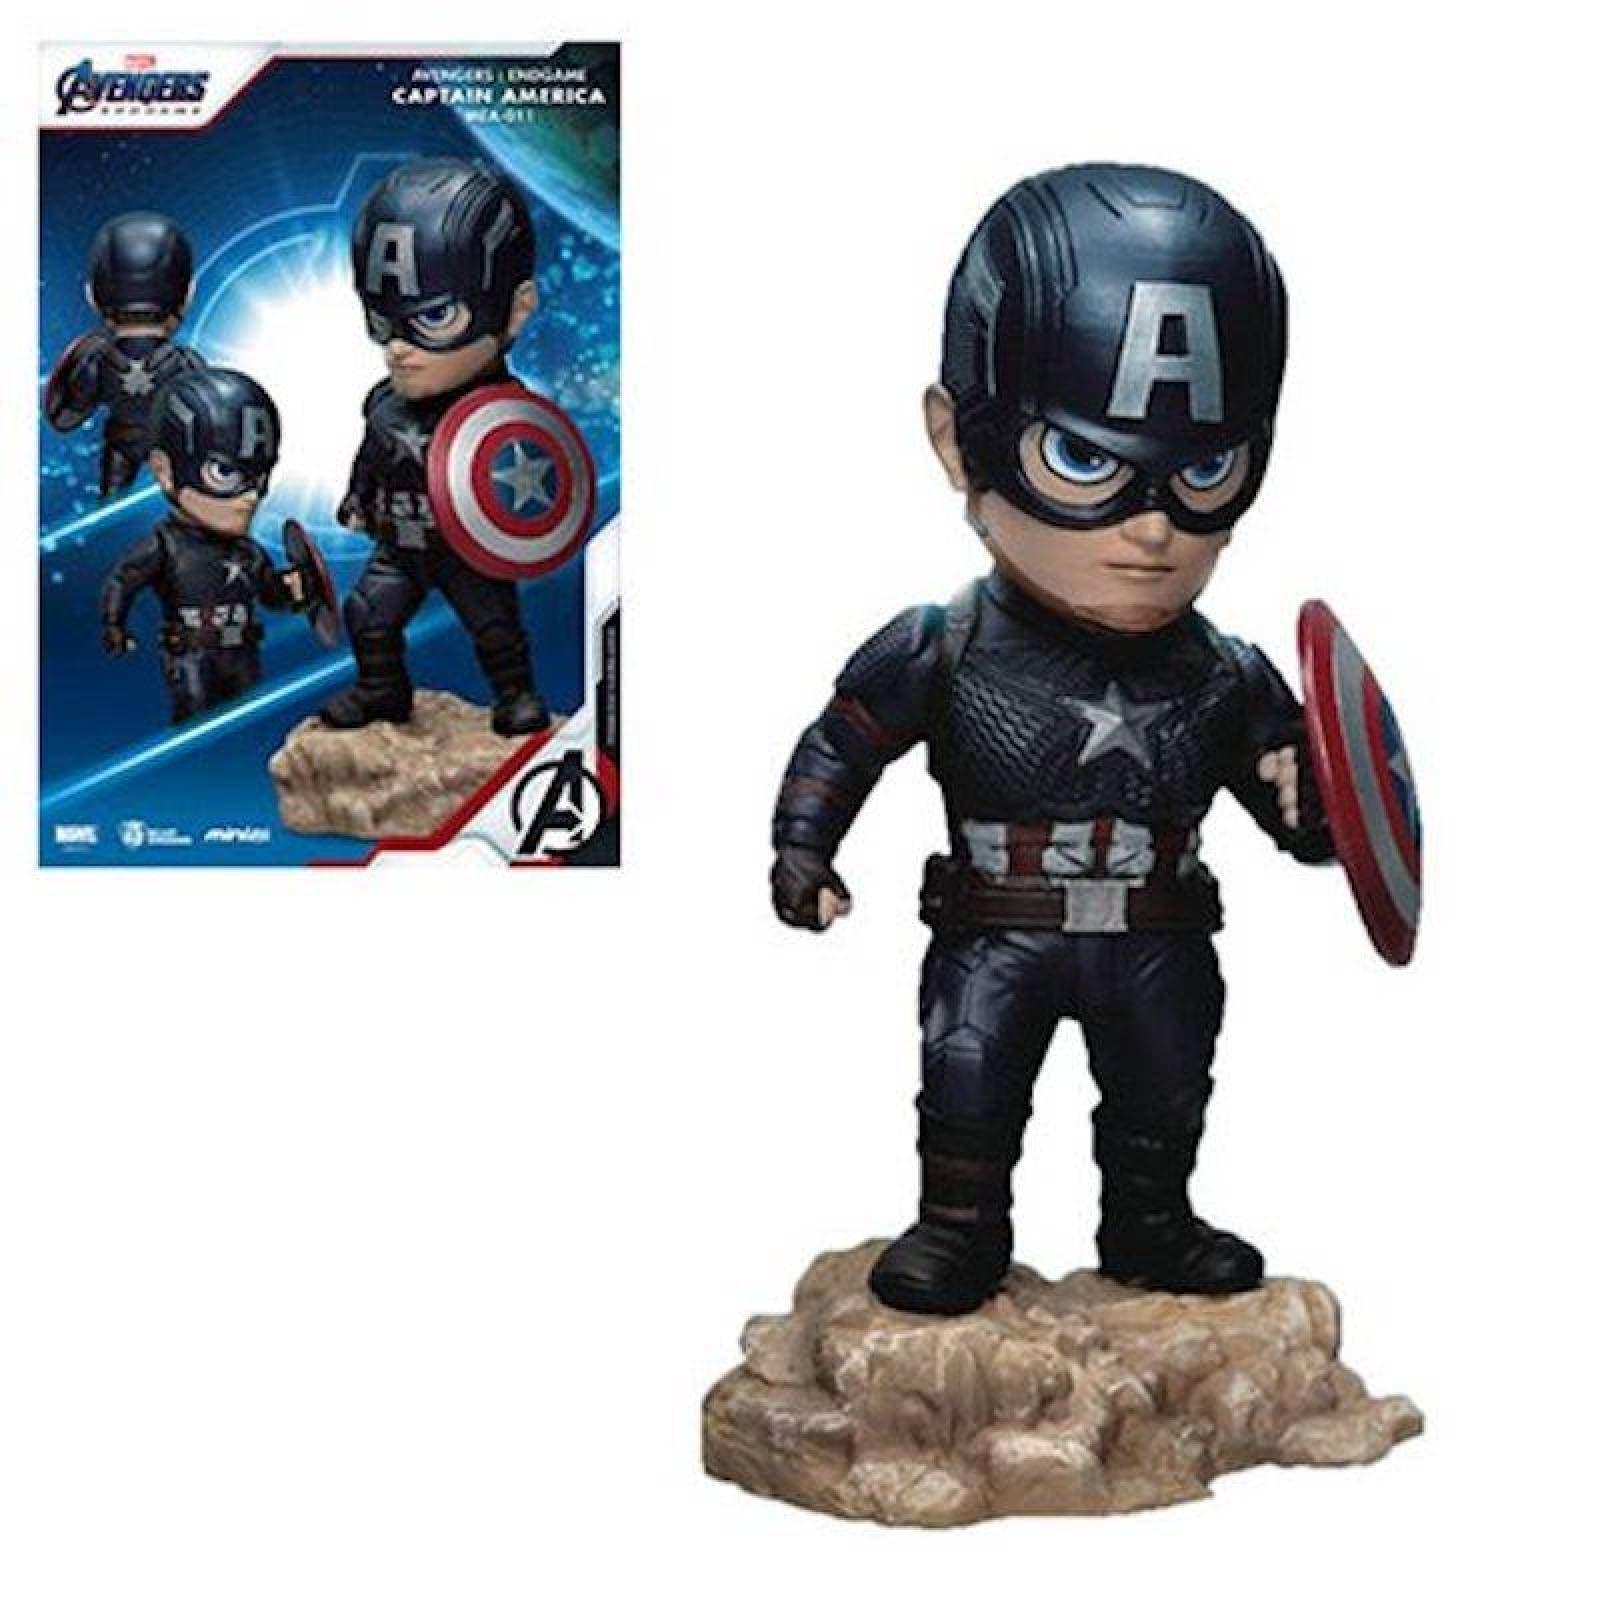 Capitan America Avengers Endgame MEA011 Egg Atack